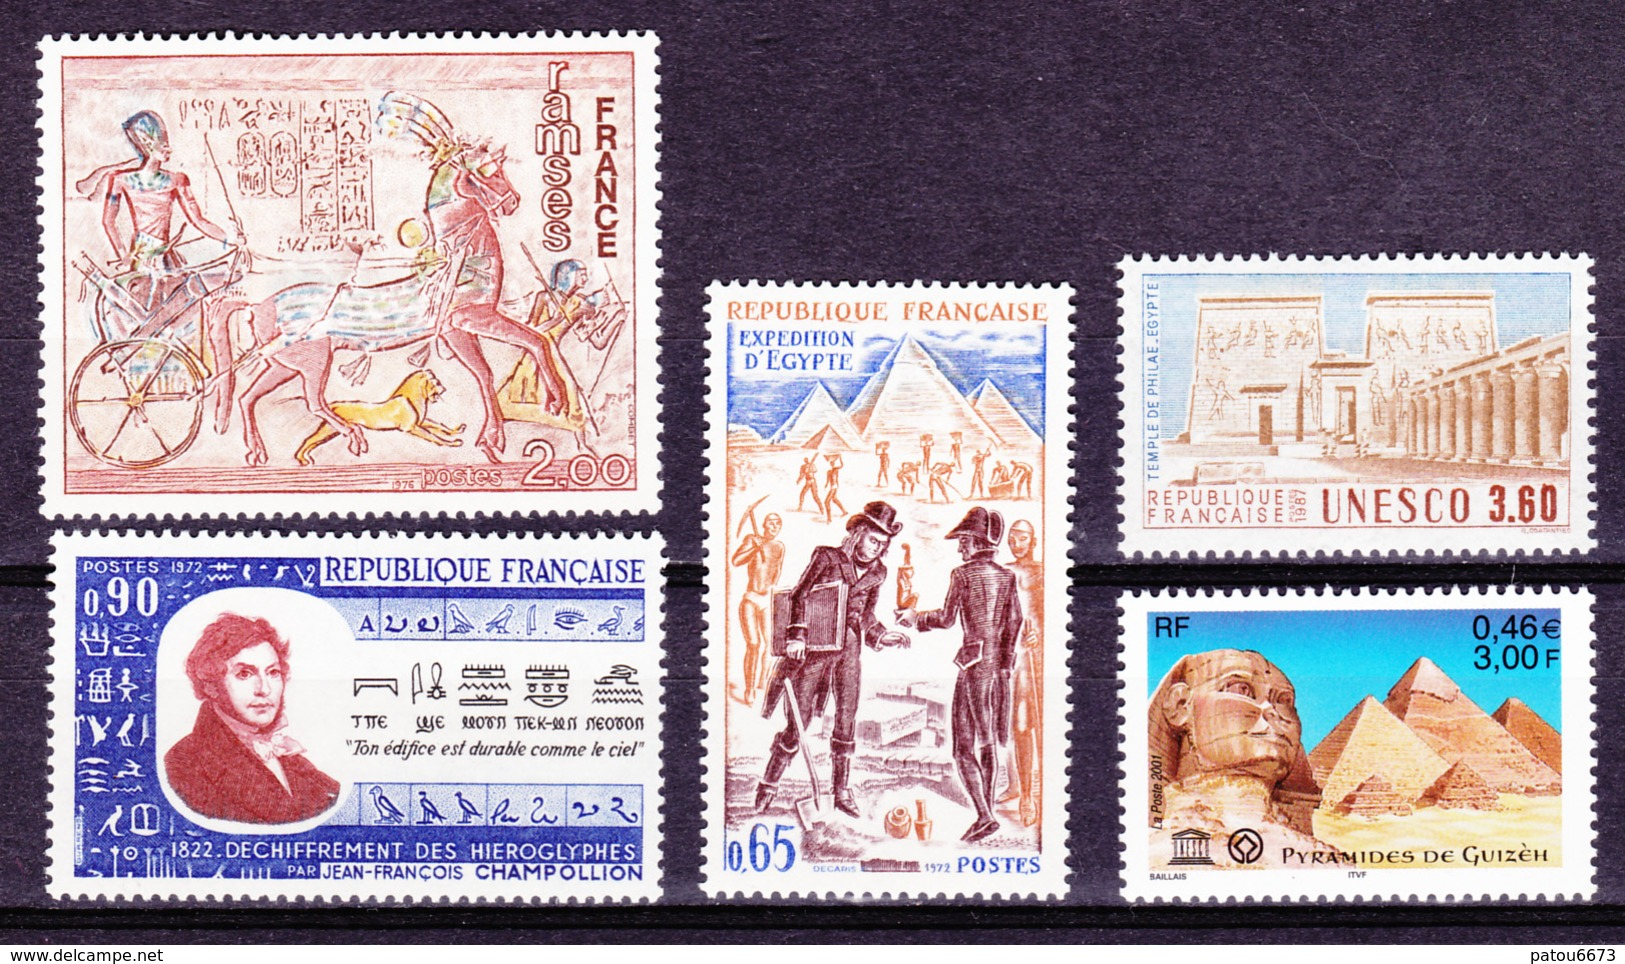 FRANCE 1972 To 2001 Egypt Archeology, 5 Stamps (Ramses, Gyzeh Pyramids, Abu-Simbel Champollion...) MNH Luxe - Archeologia